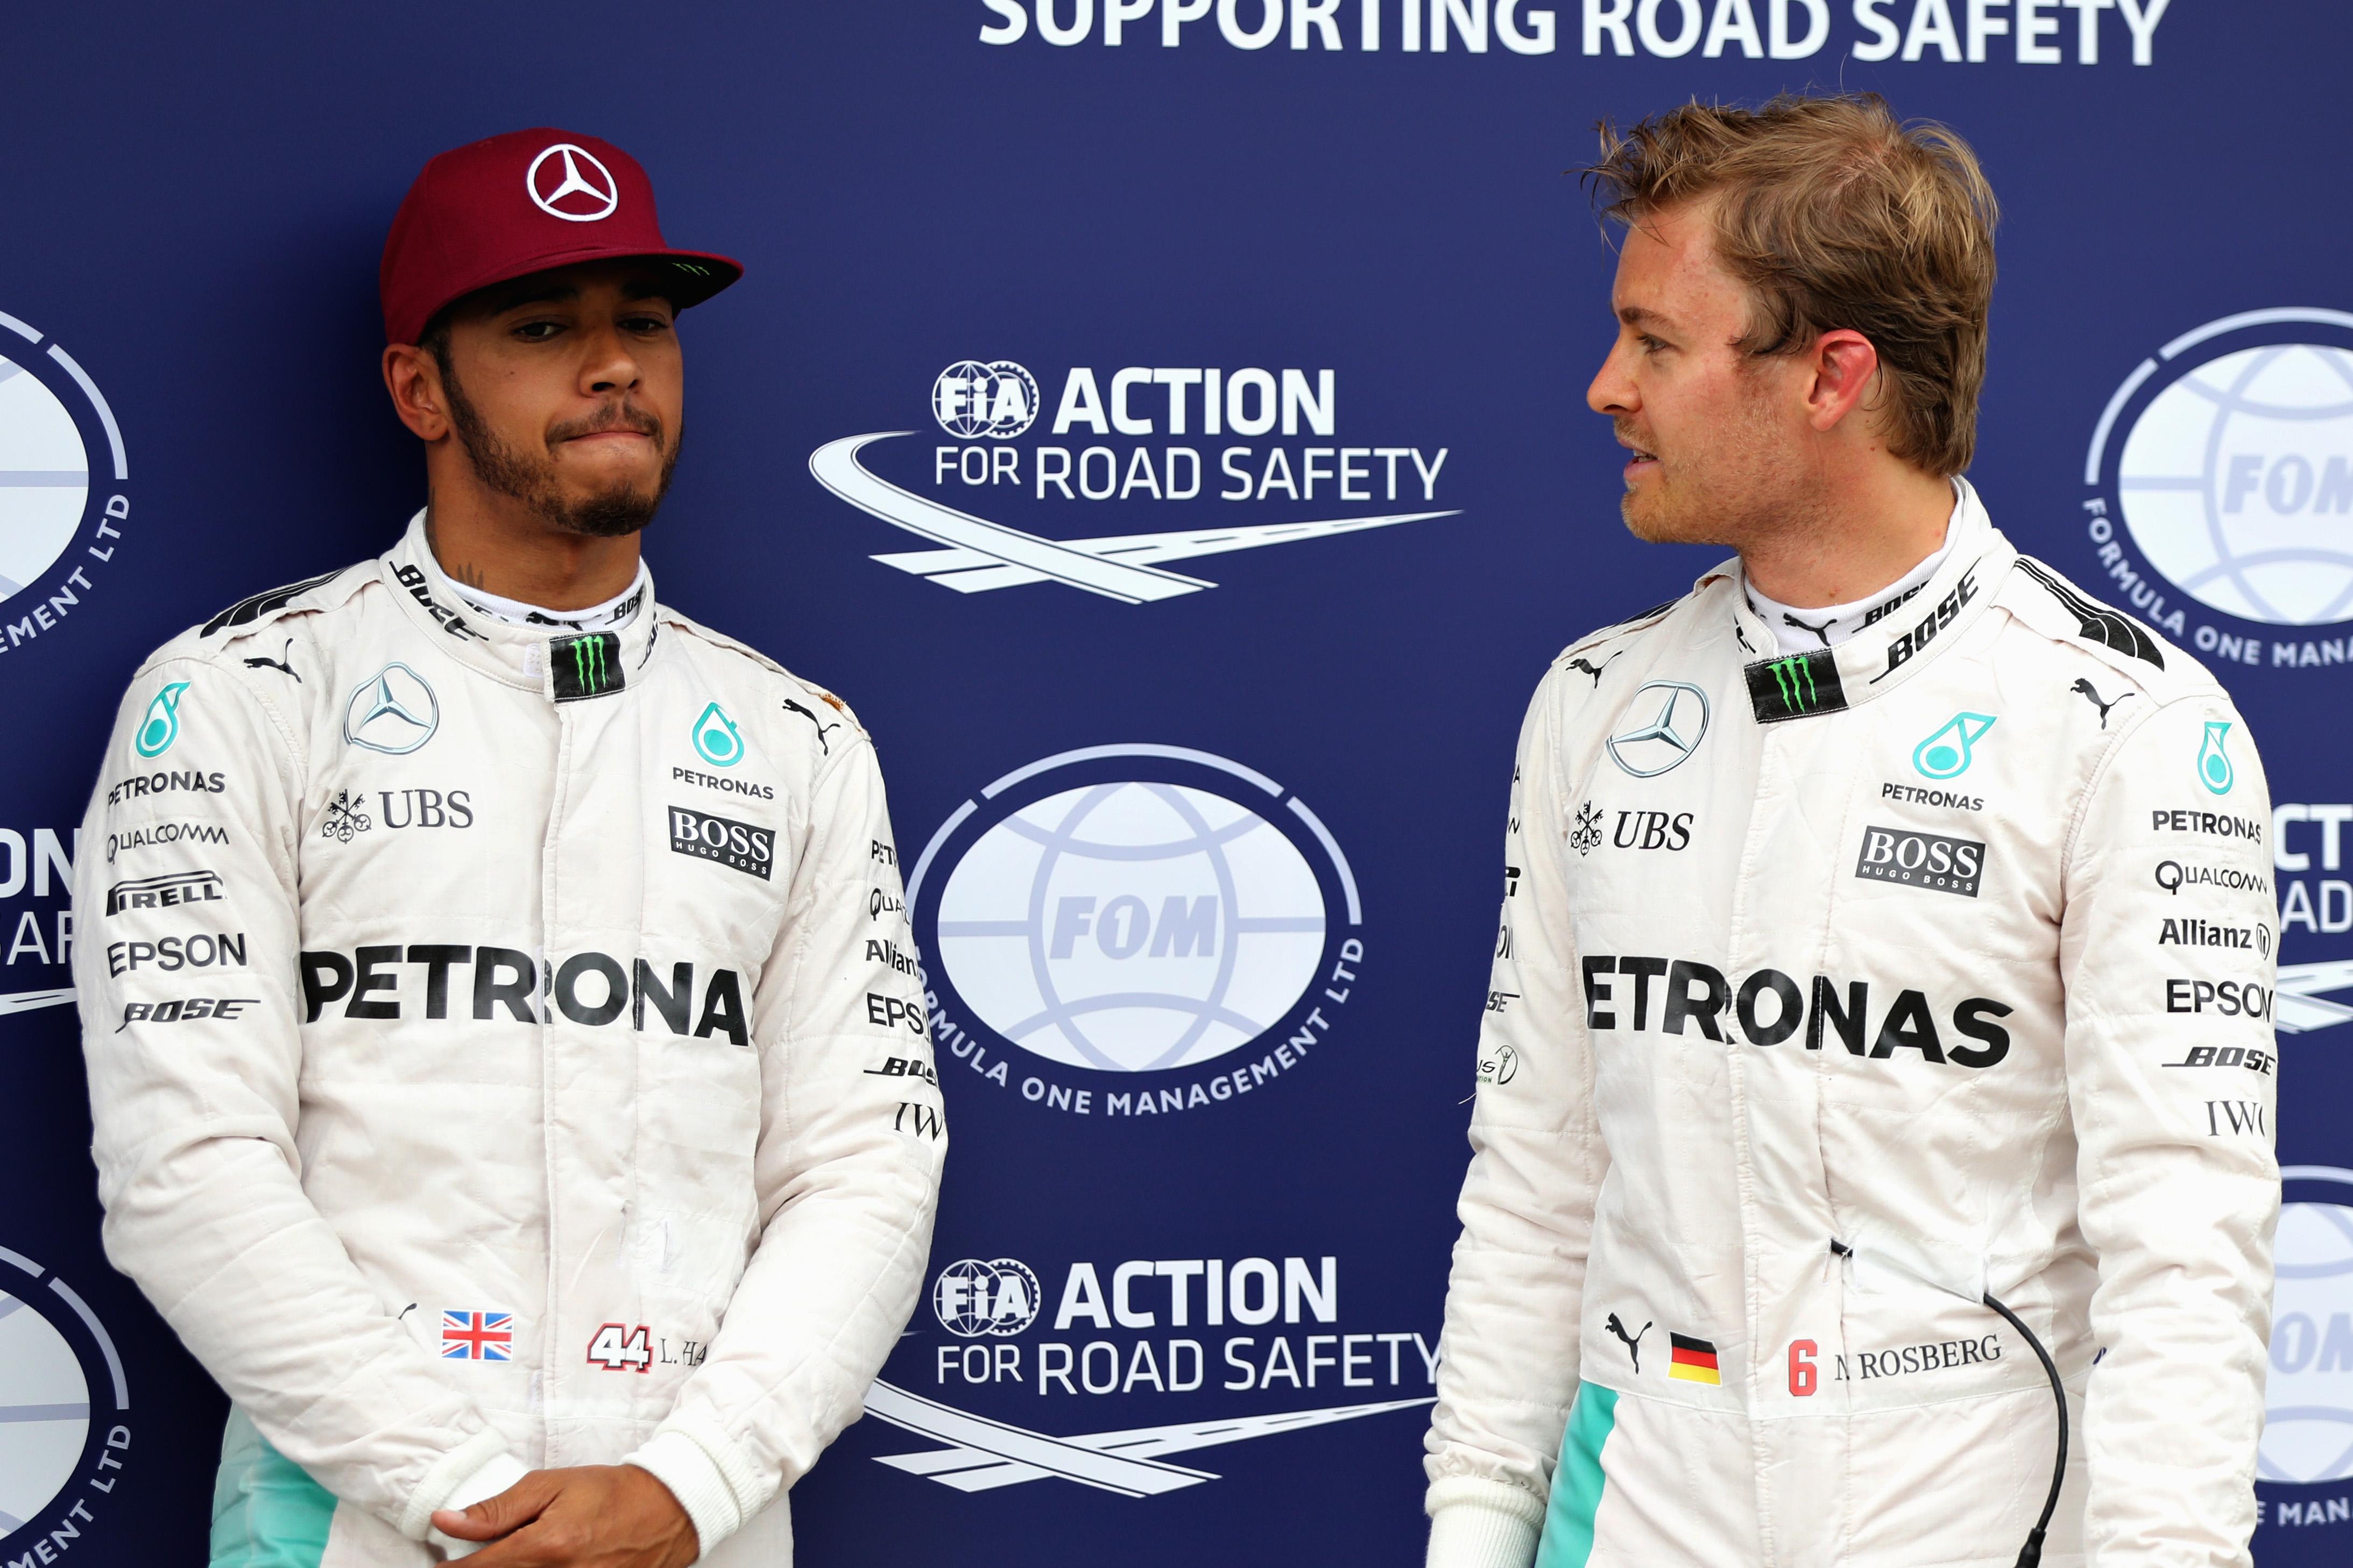 Mercedes boss slams Lewis Hamilton and Nico Rosberg as 'brainless' after Austrian Grand Prix crash